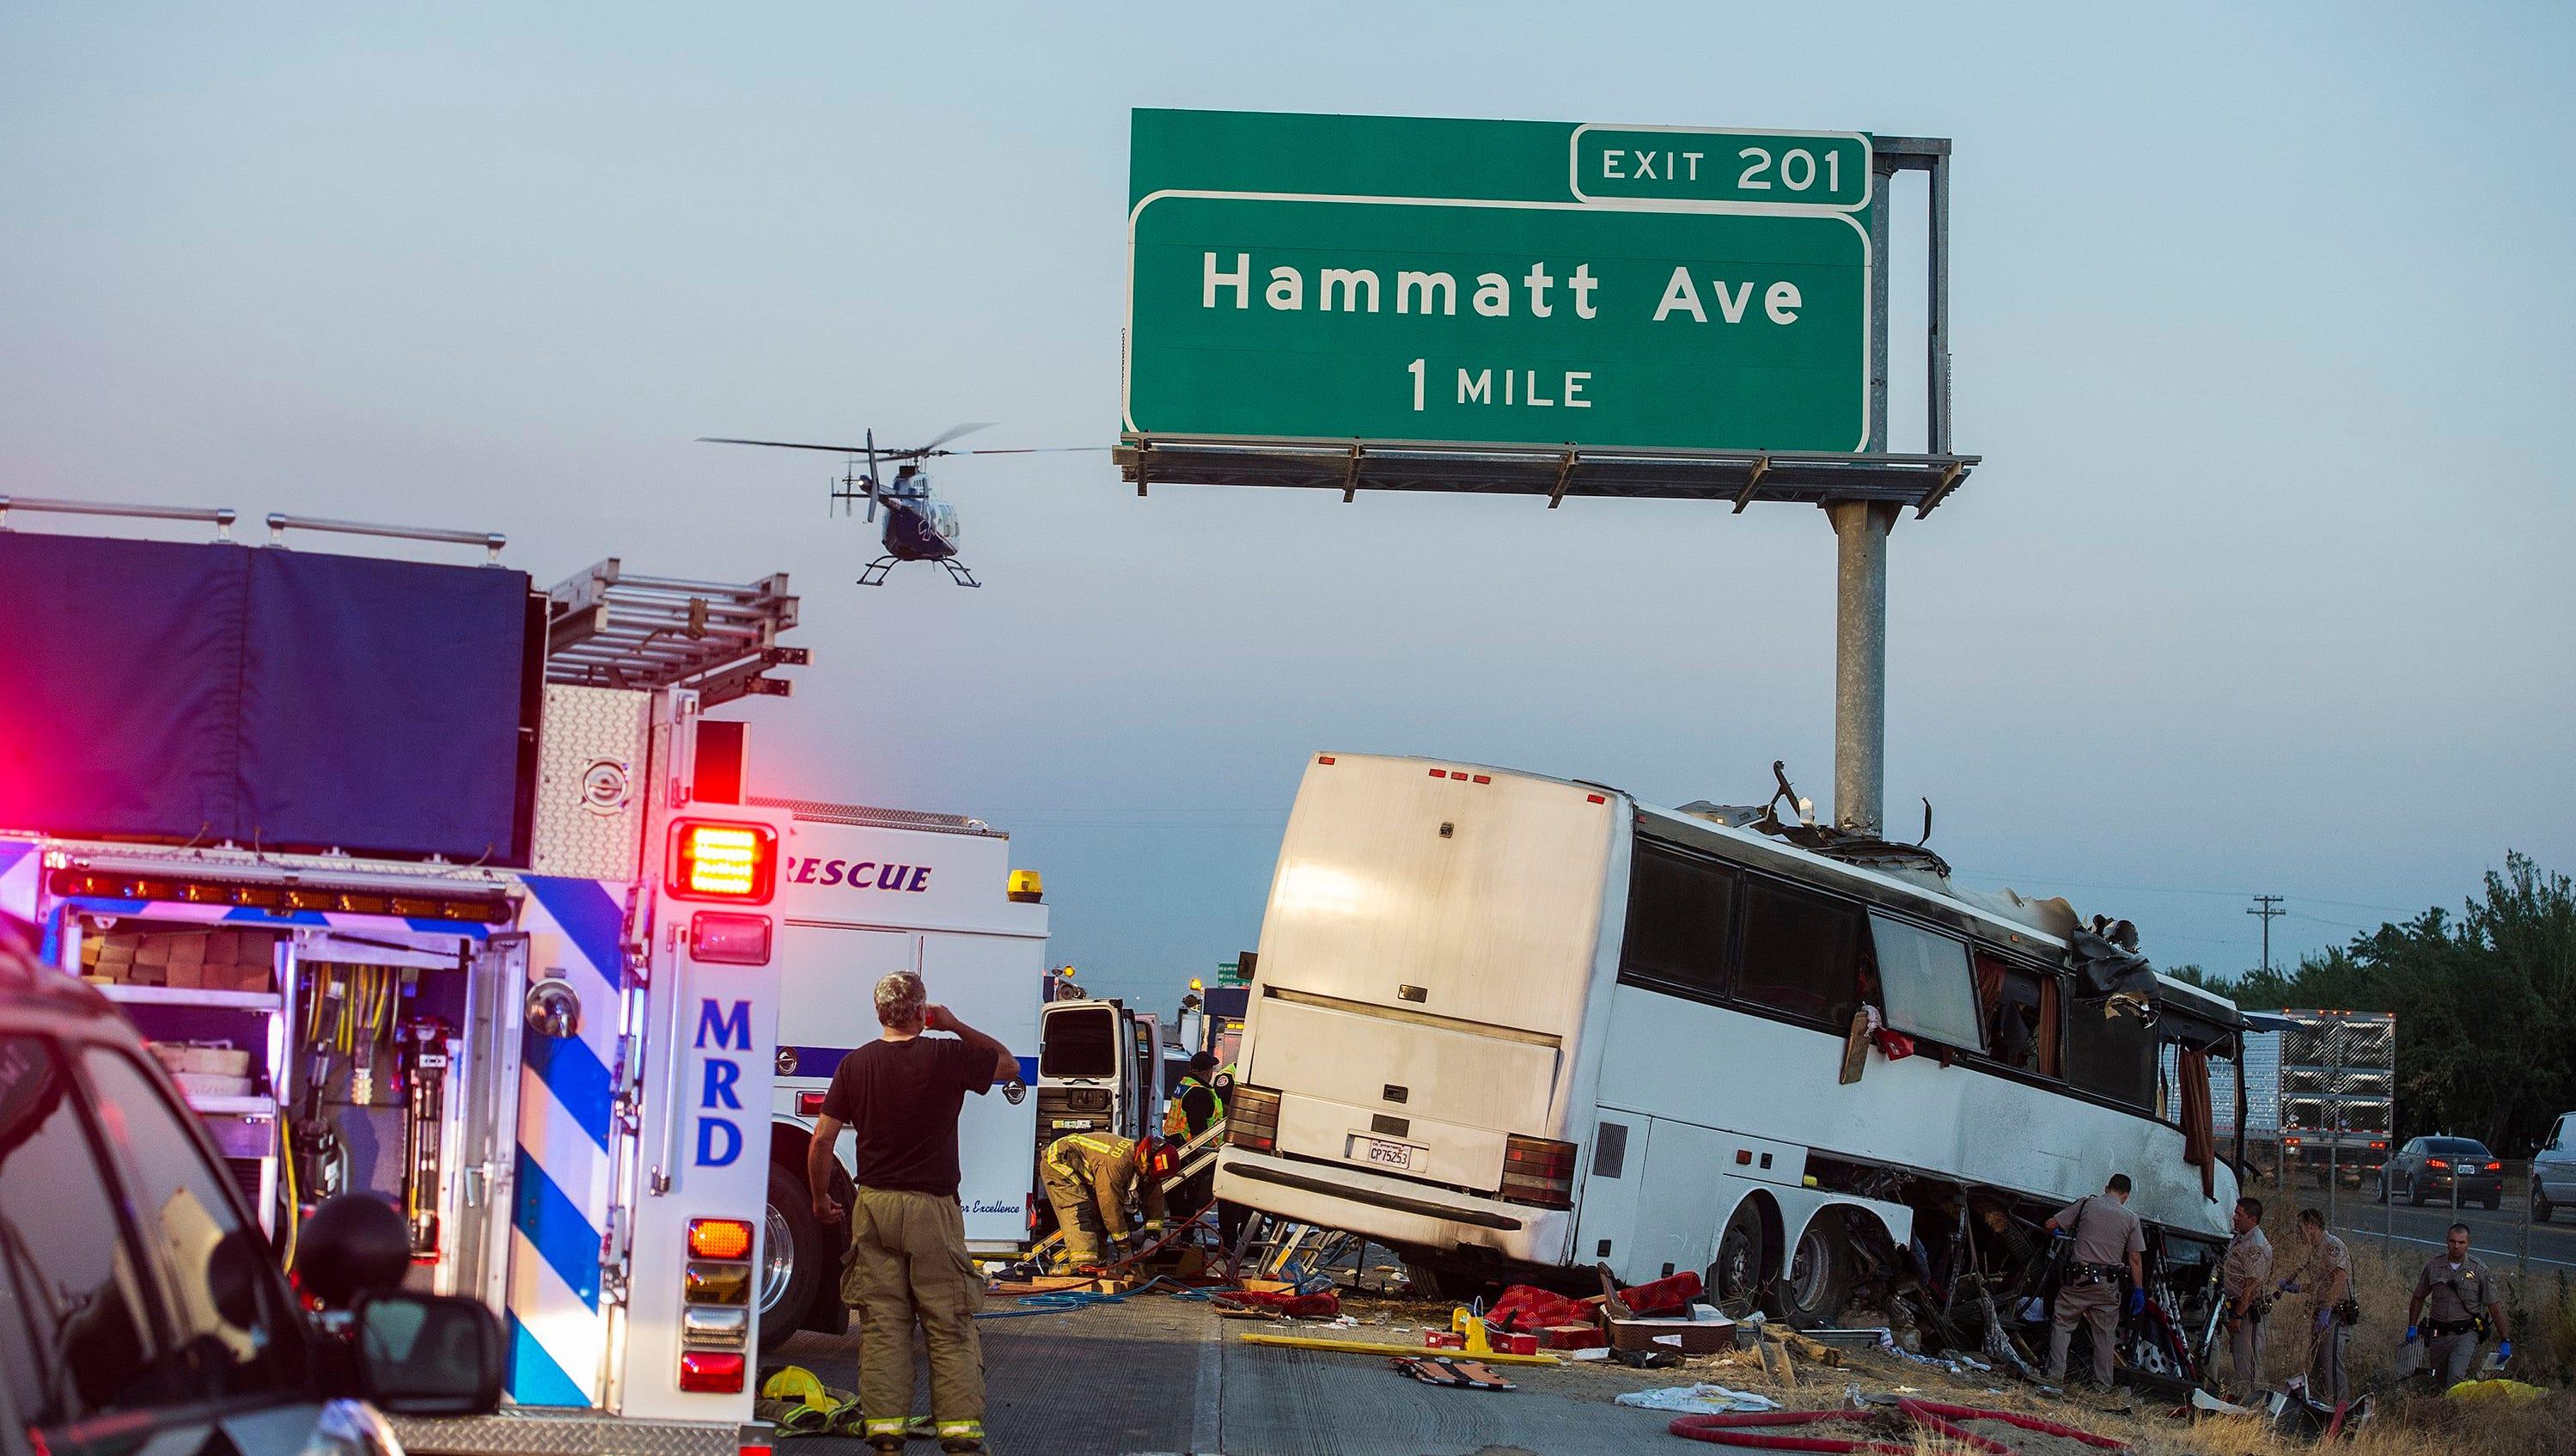 Highway Pole Rips Through Bus In California Crash Killing 5